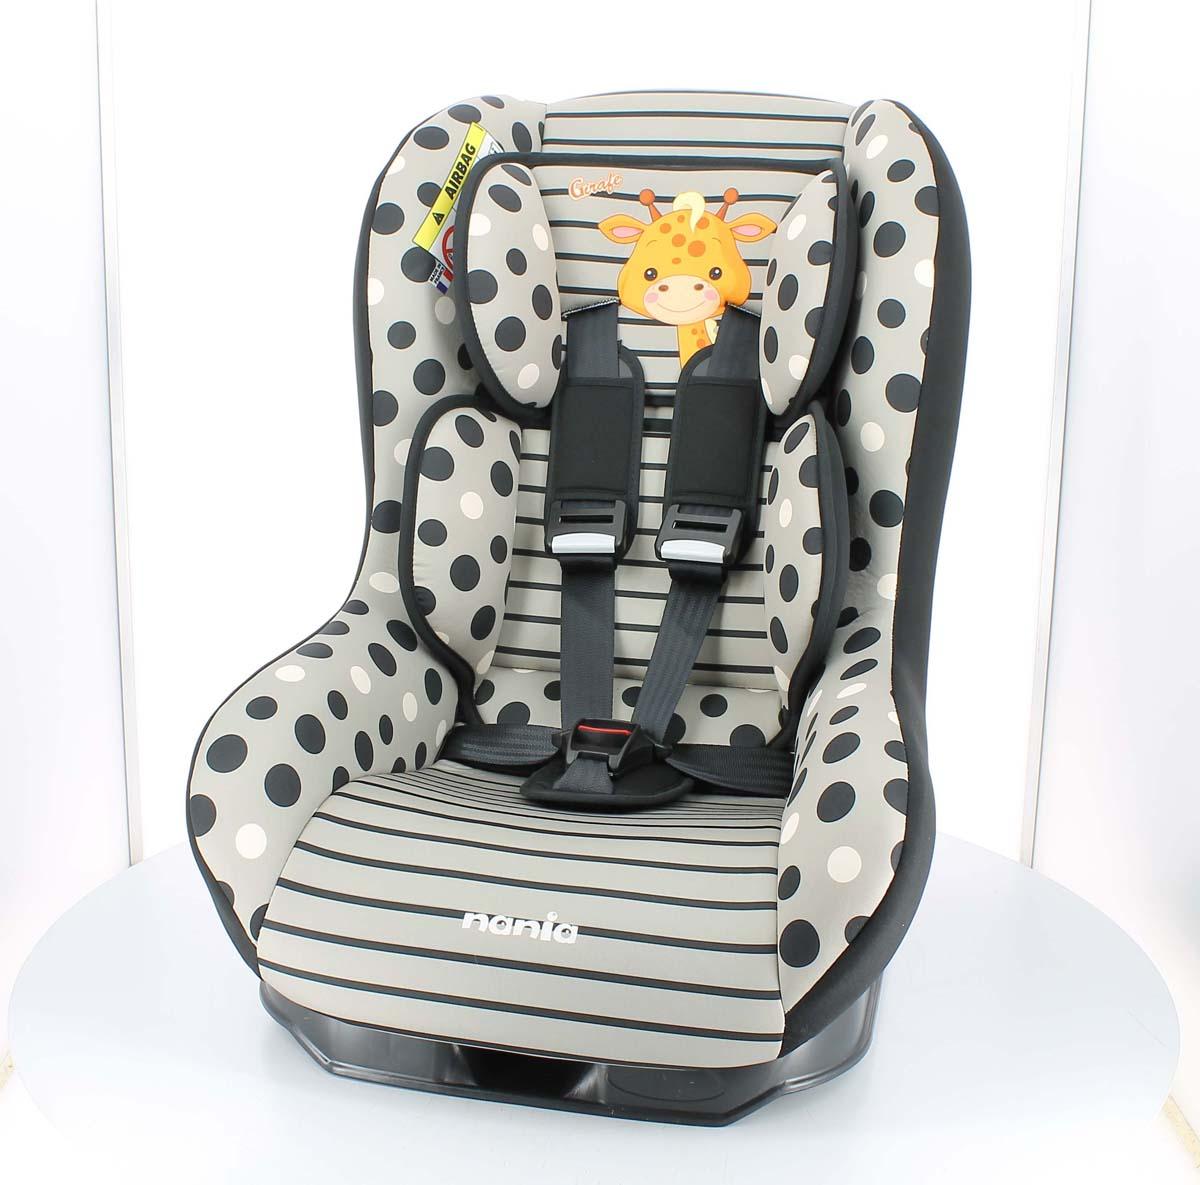 Nania Автокресло Driver Girafe от 0 до 18 кг -  Автокресла и аксессуары